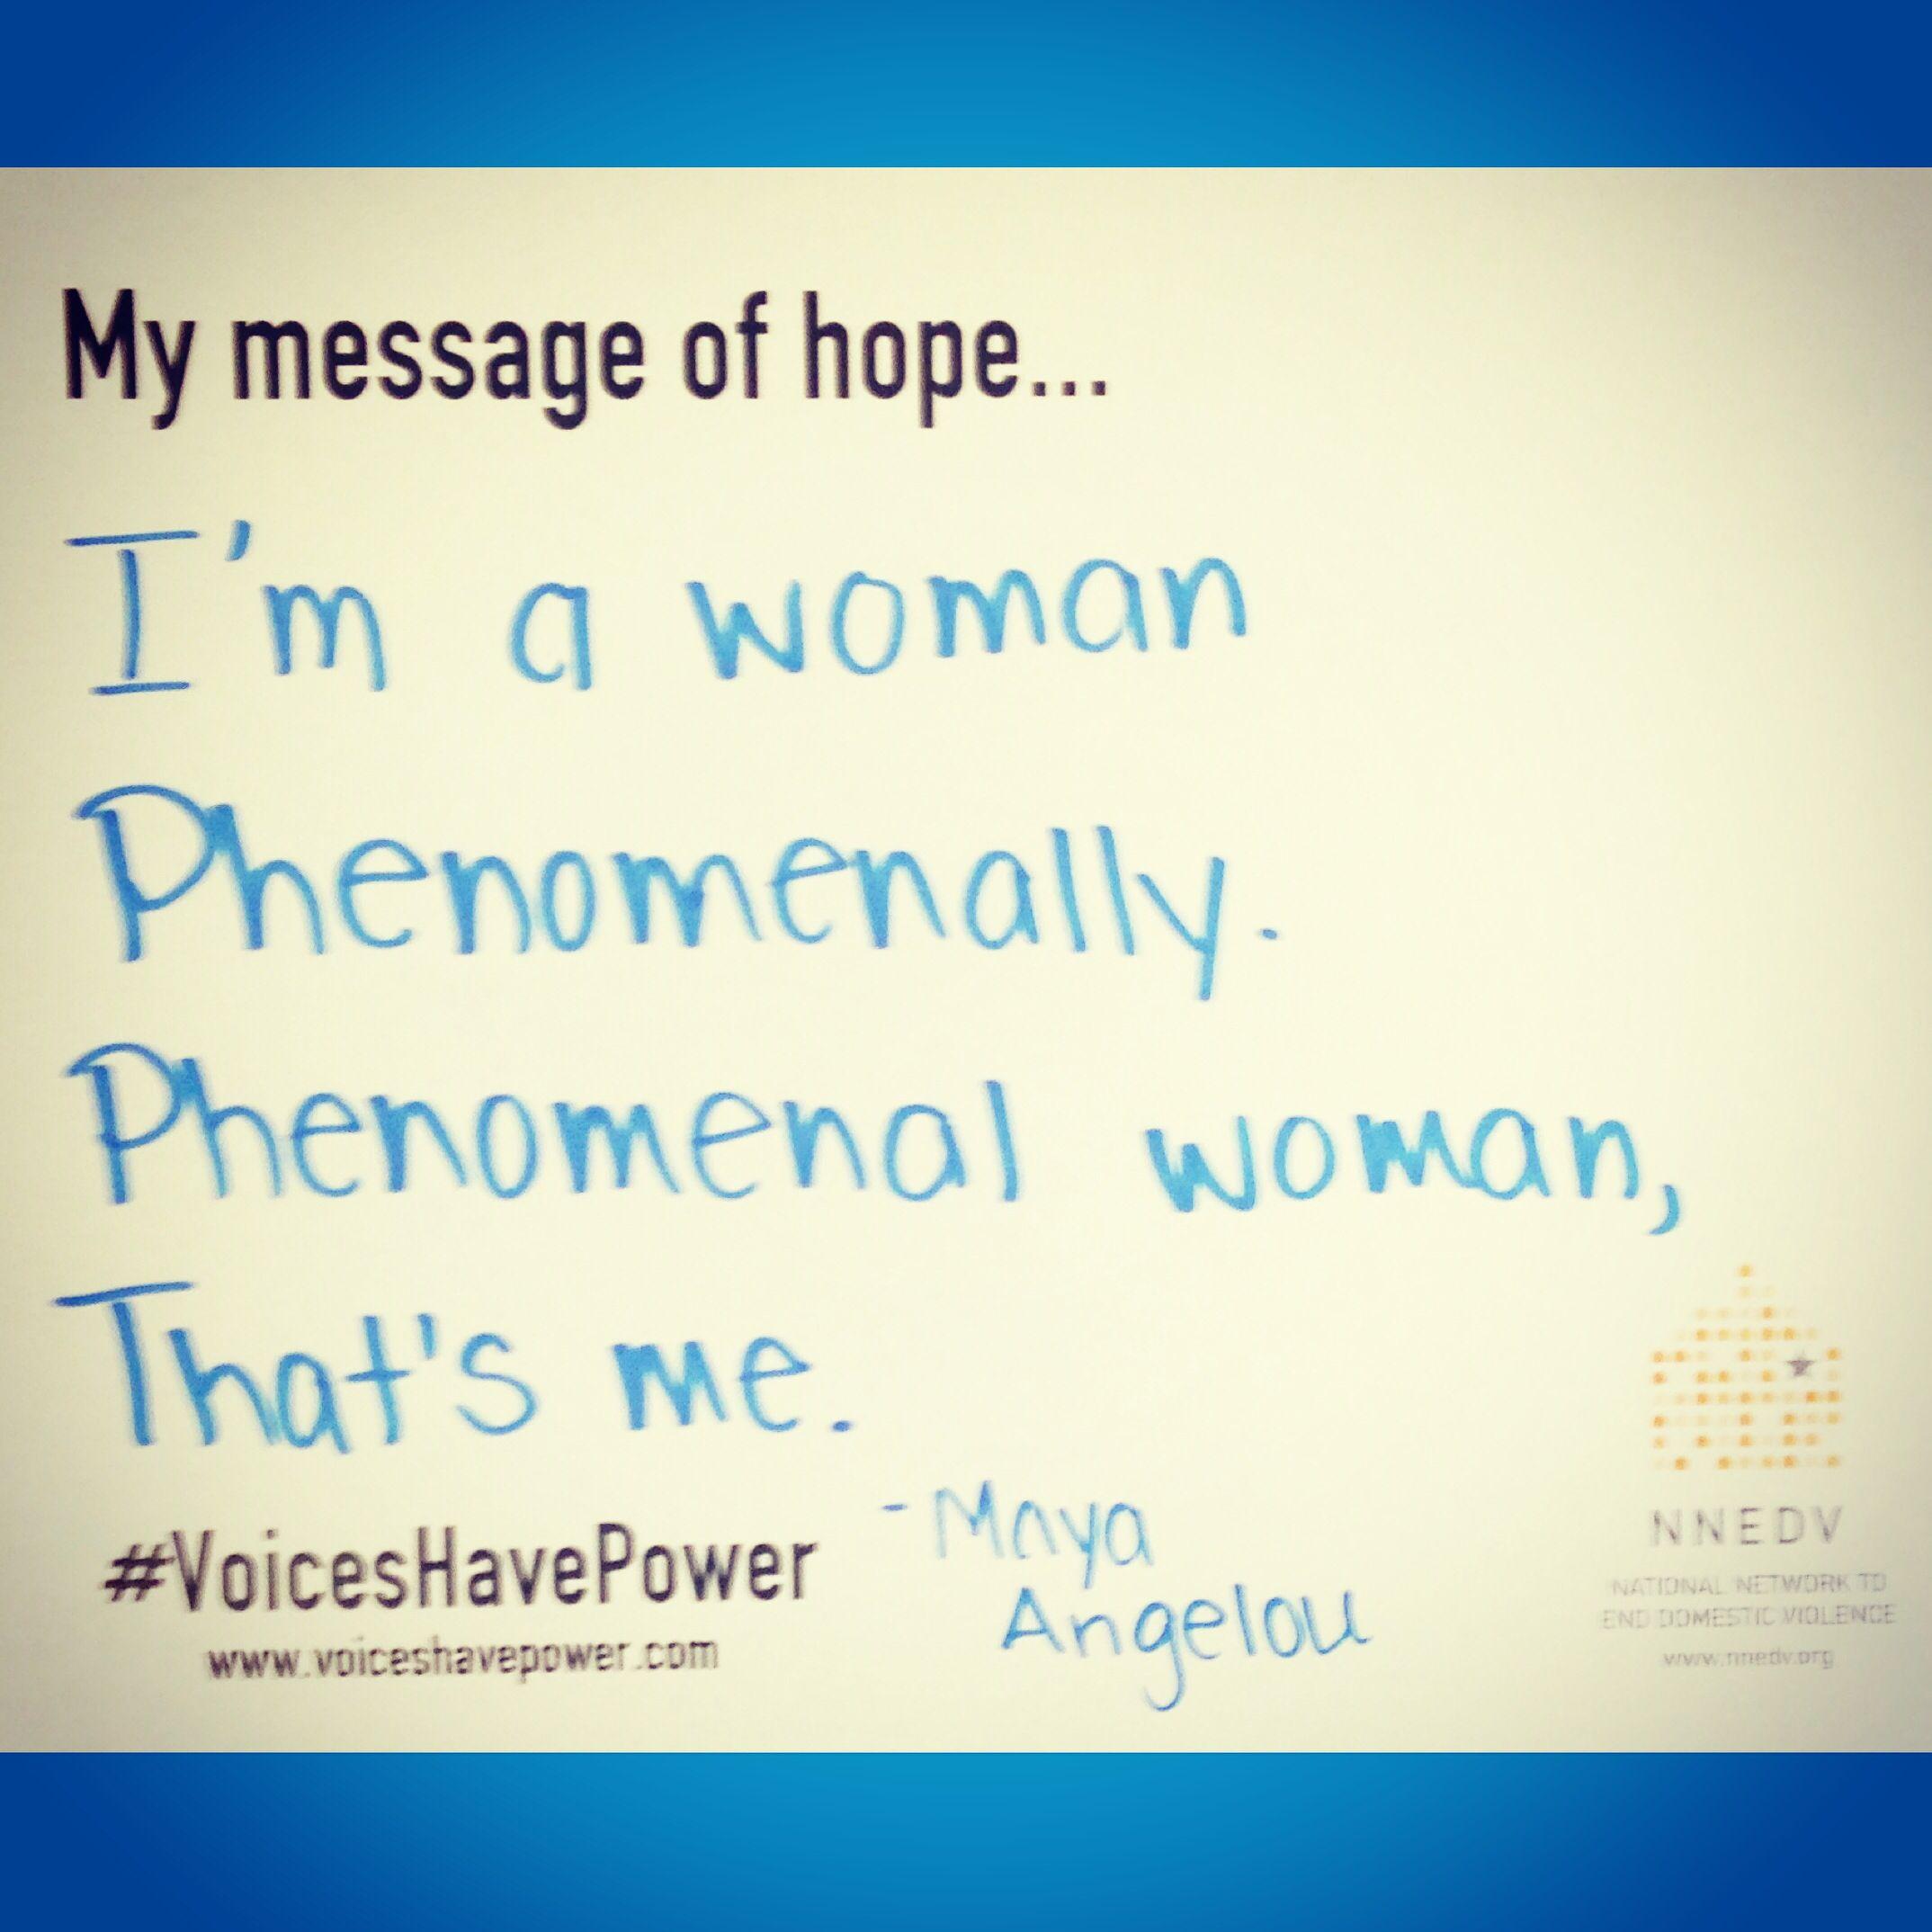 Phenomenal Woman Quotes I'm A Woman Phenomenallyphenomenal Woman That's Memaya